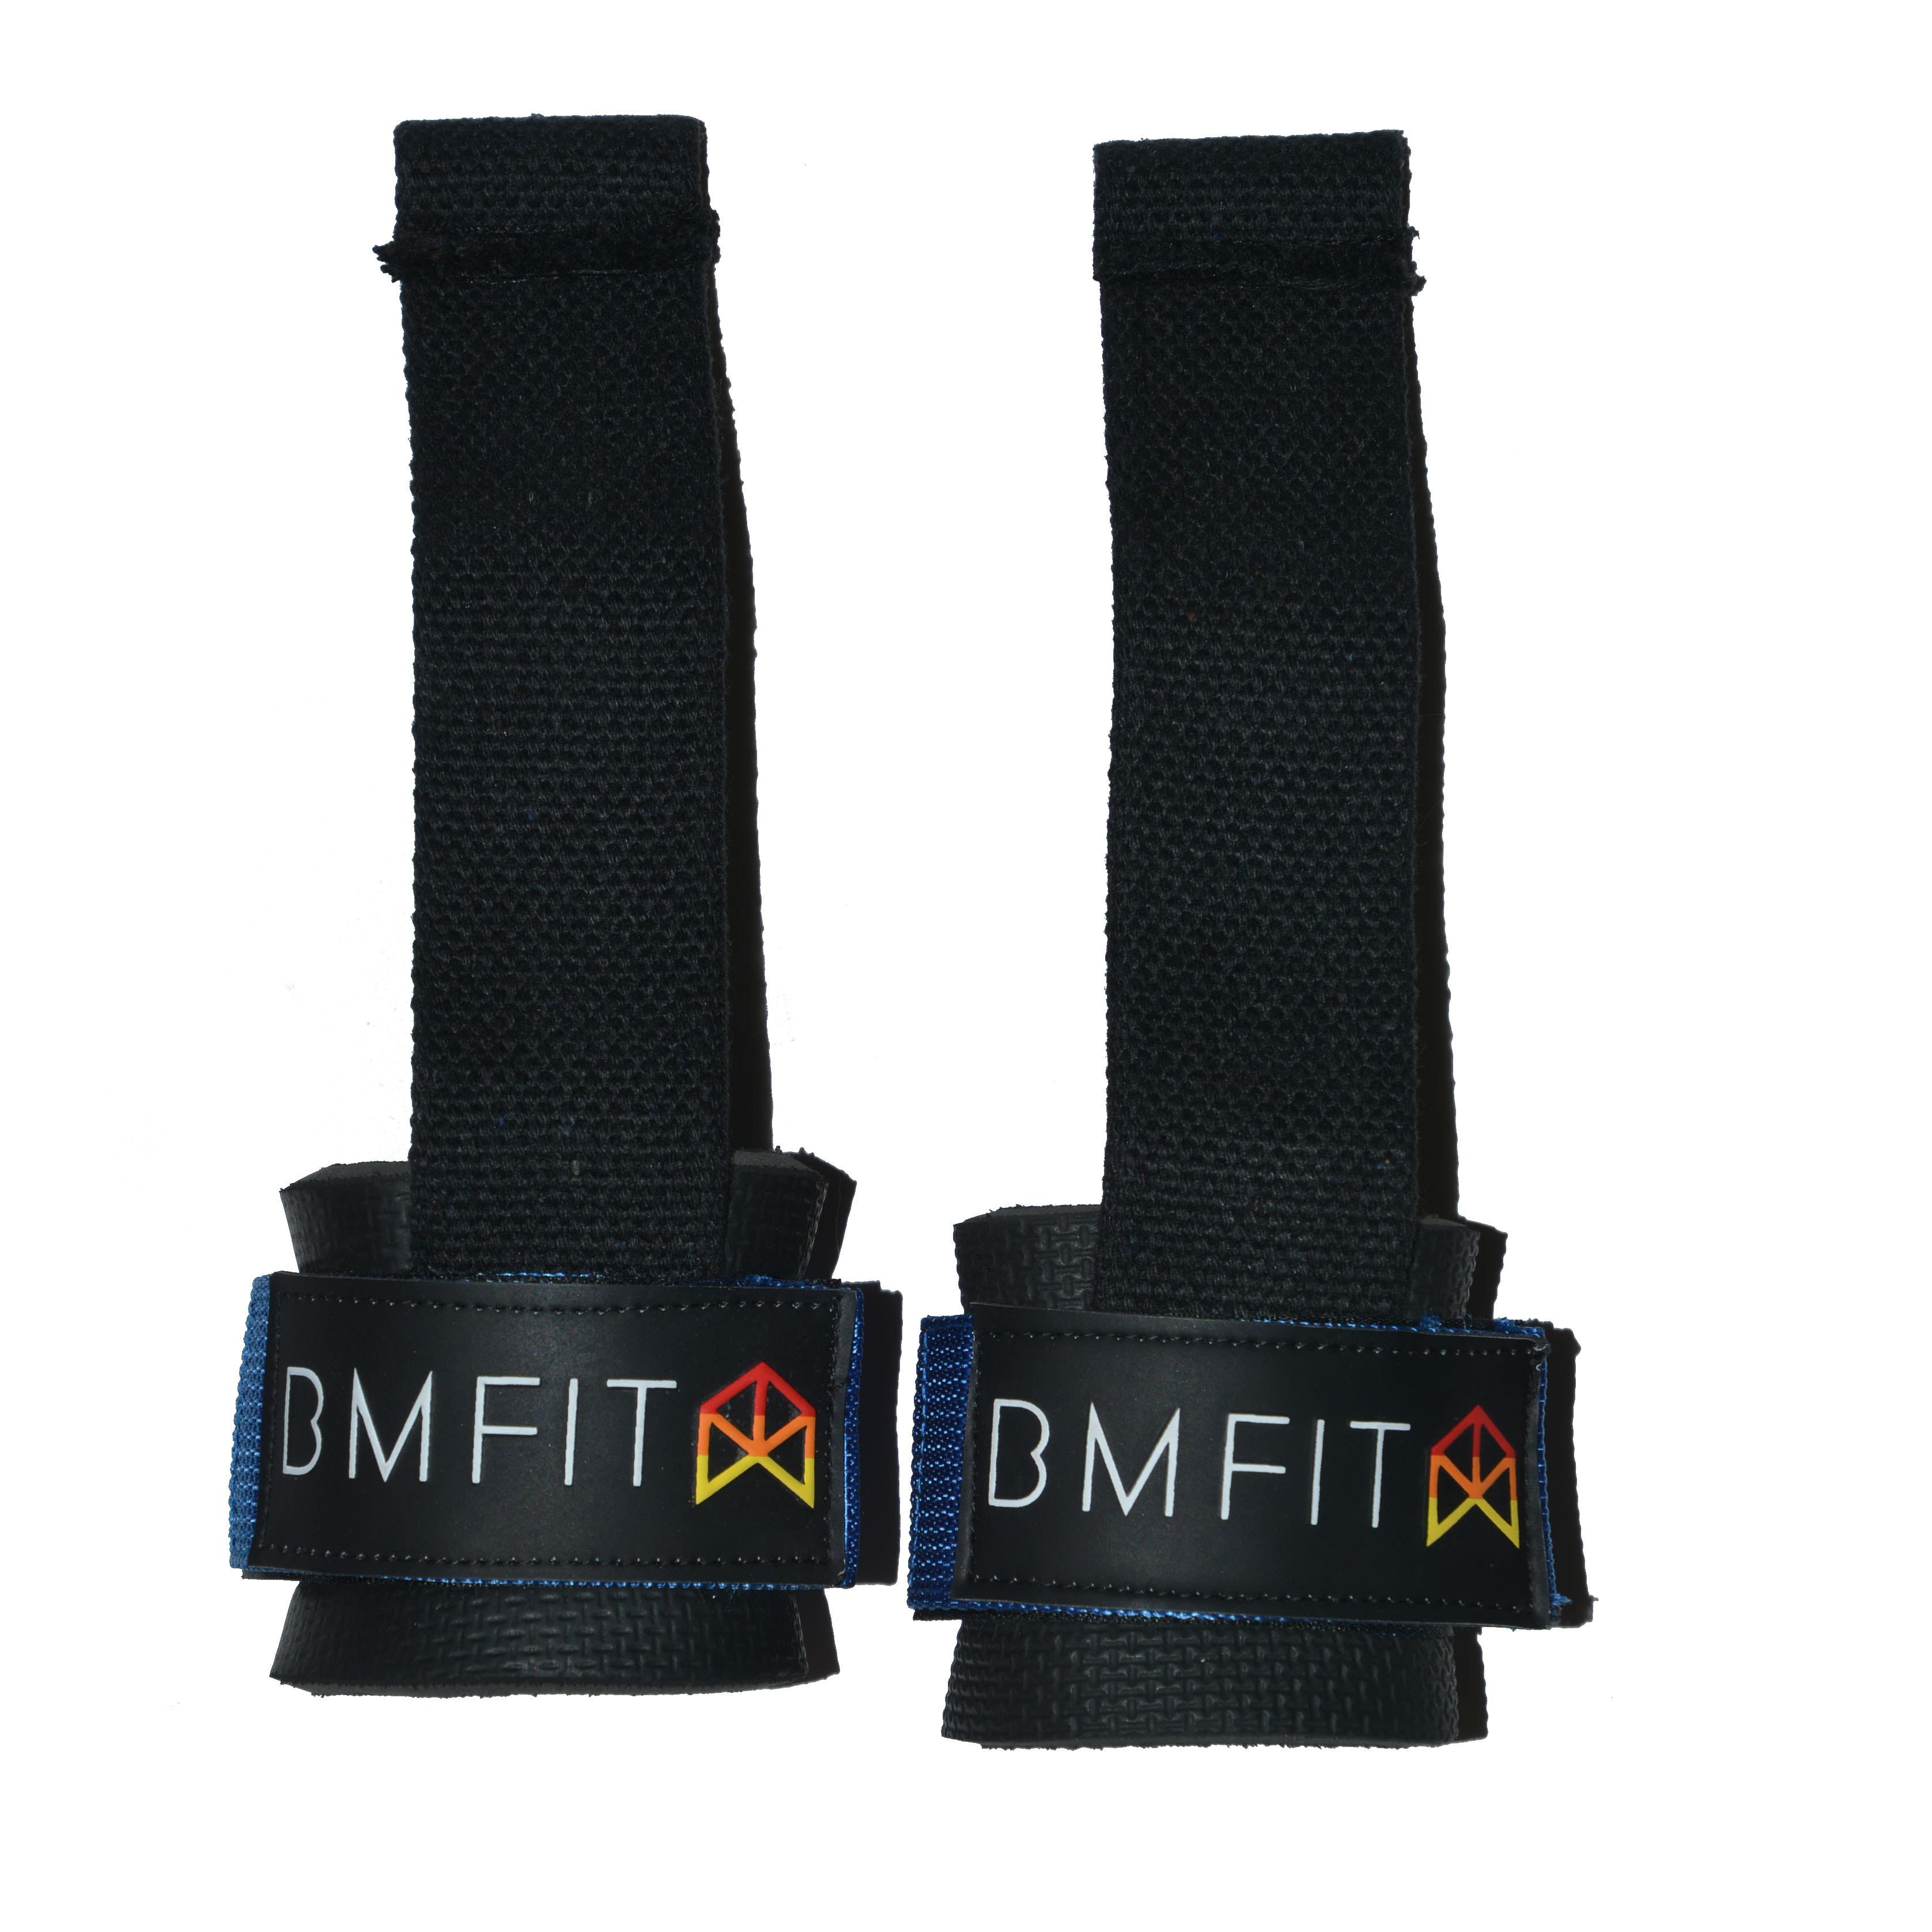 BMFIT Bodybuilding Straps - Blue